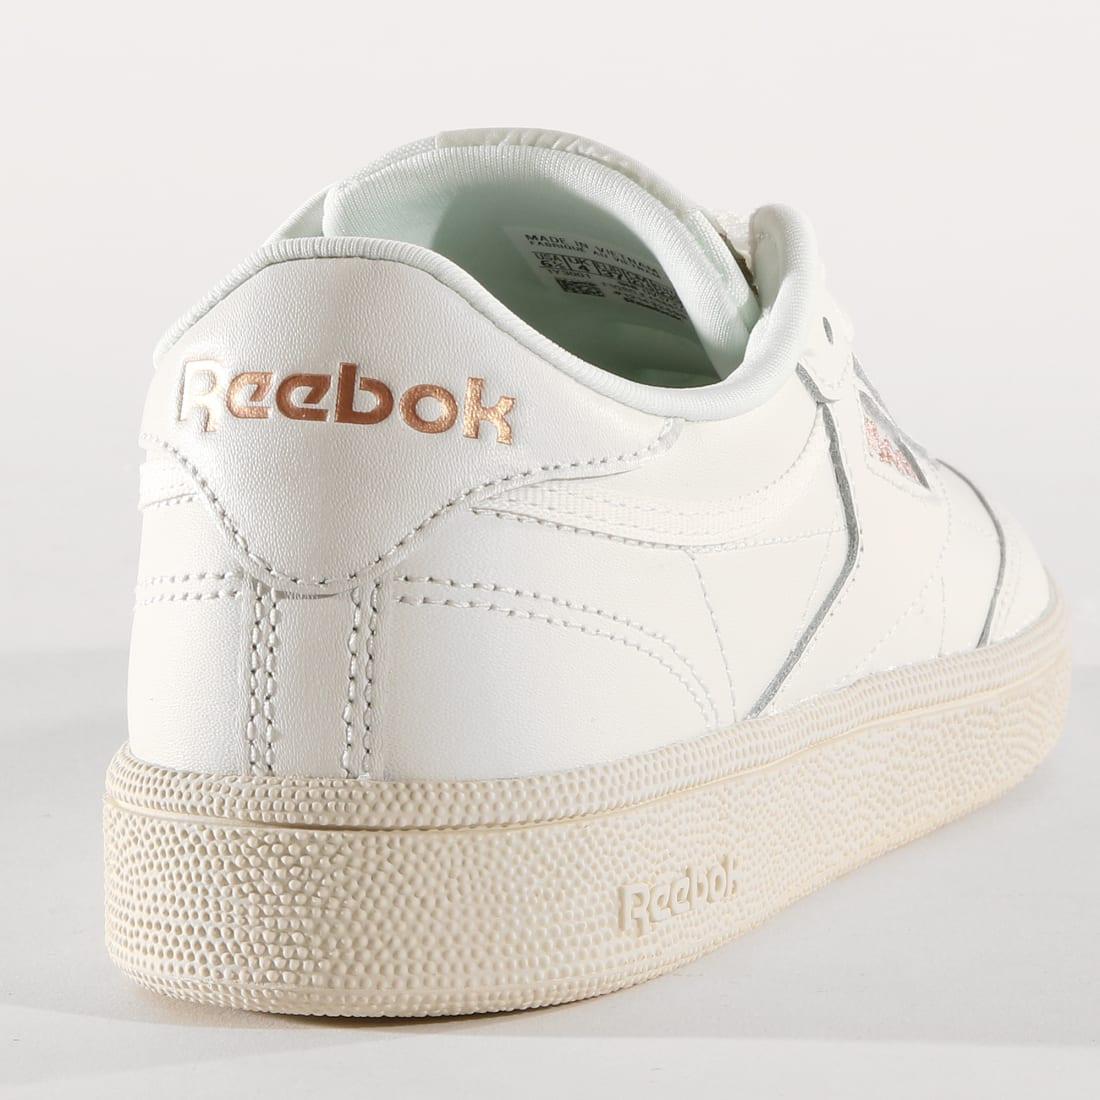 Reebok Baskets Femme Club C 85 DV3727 Chalk Rose Gold